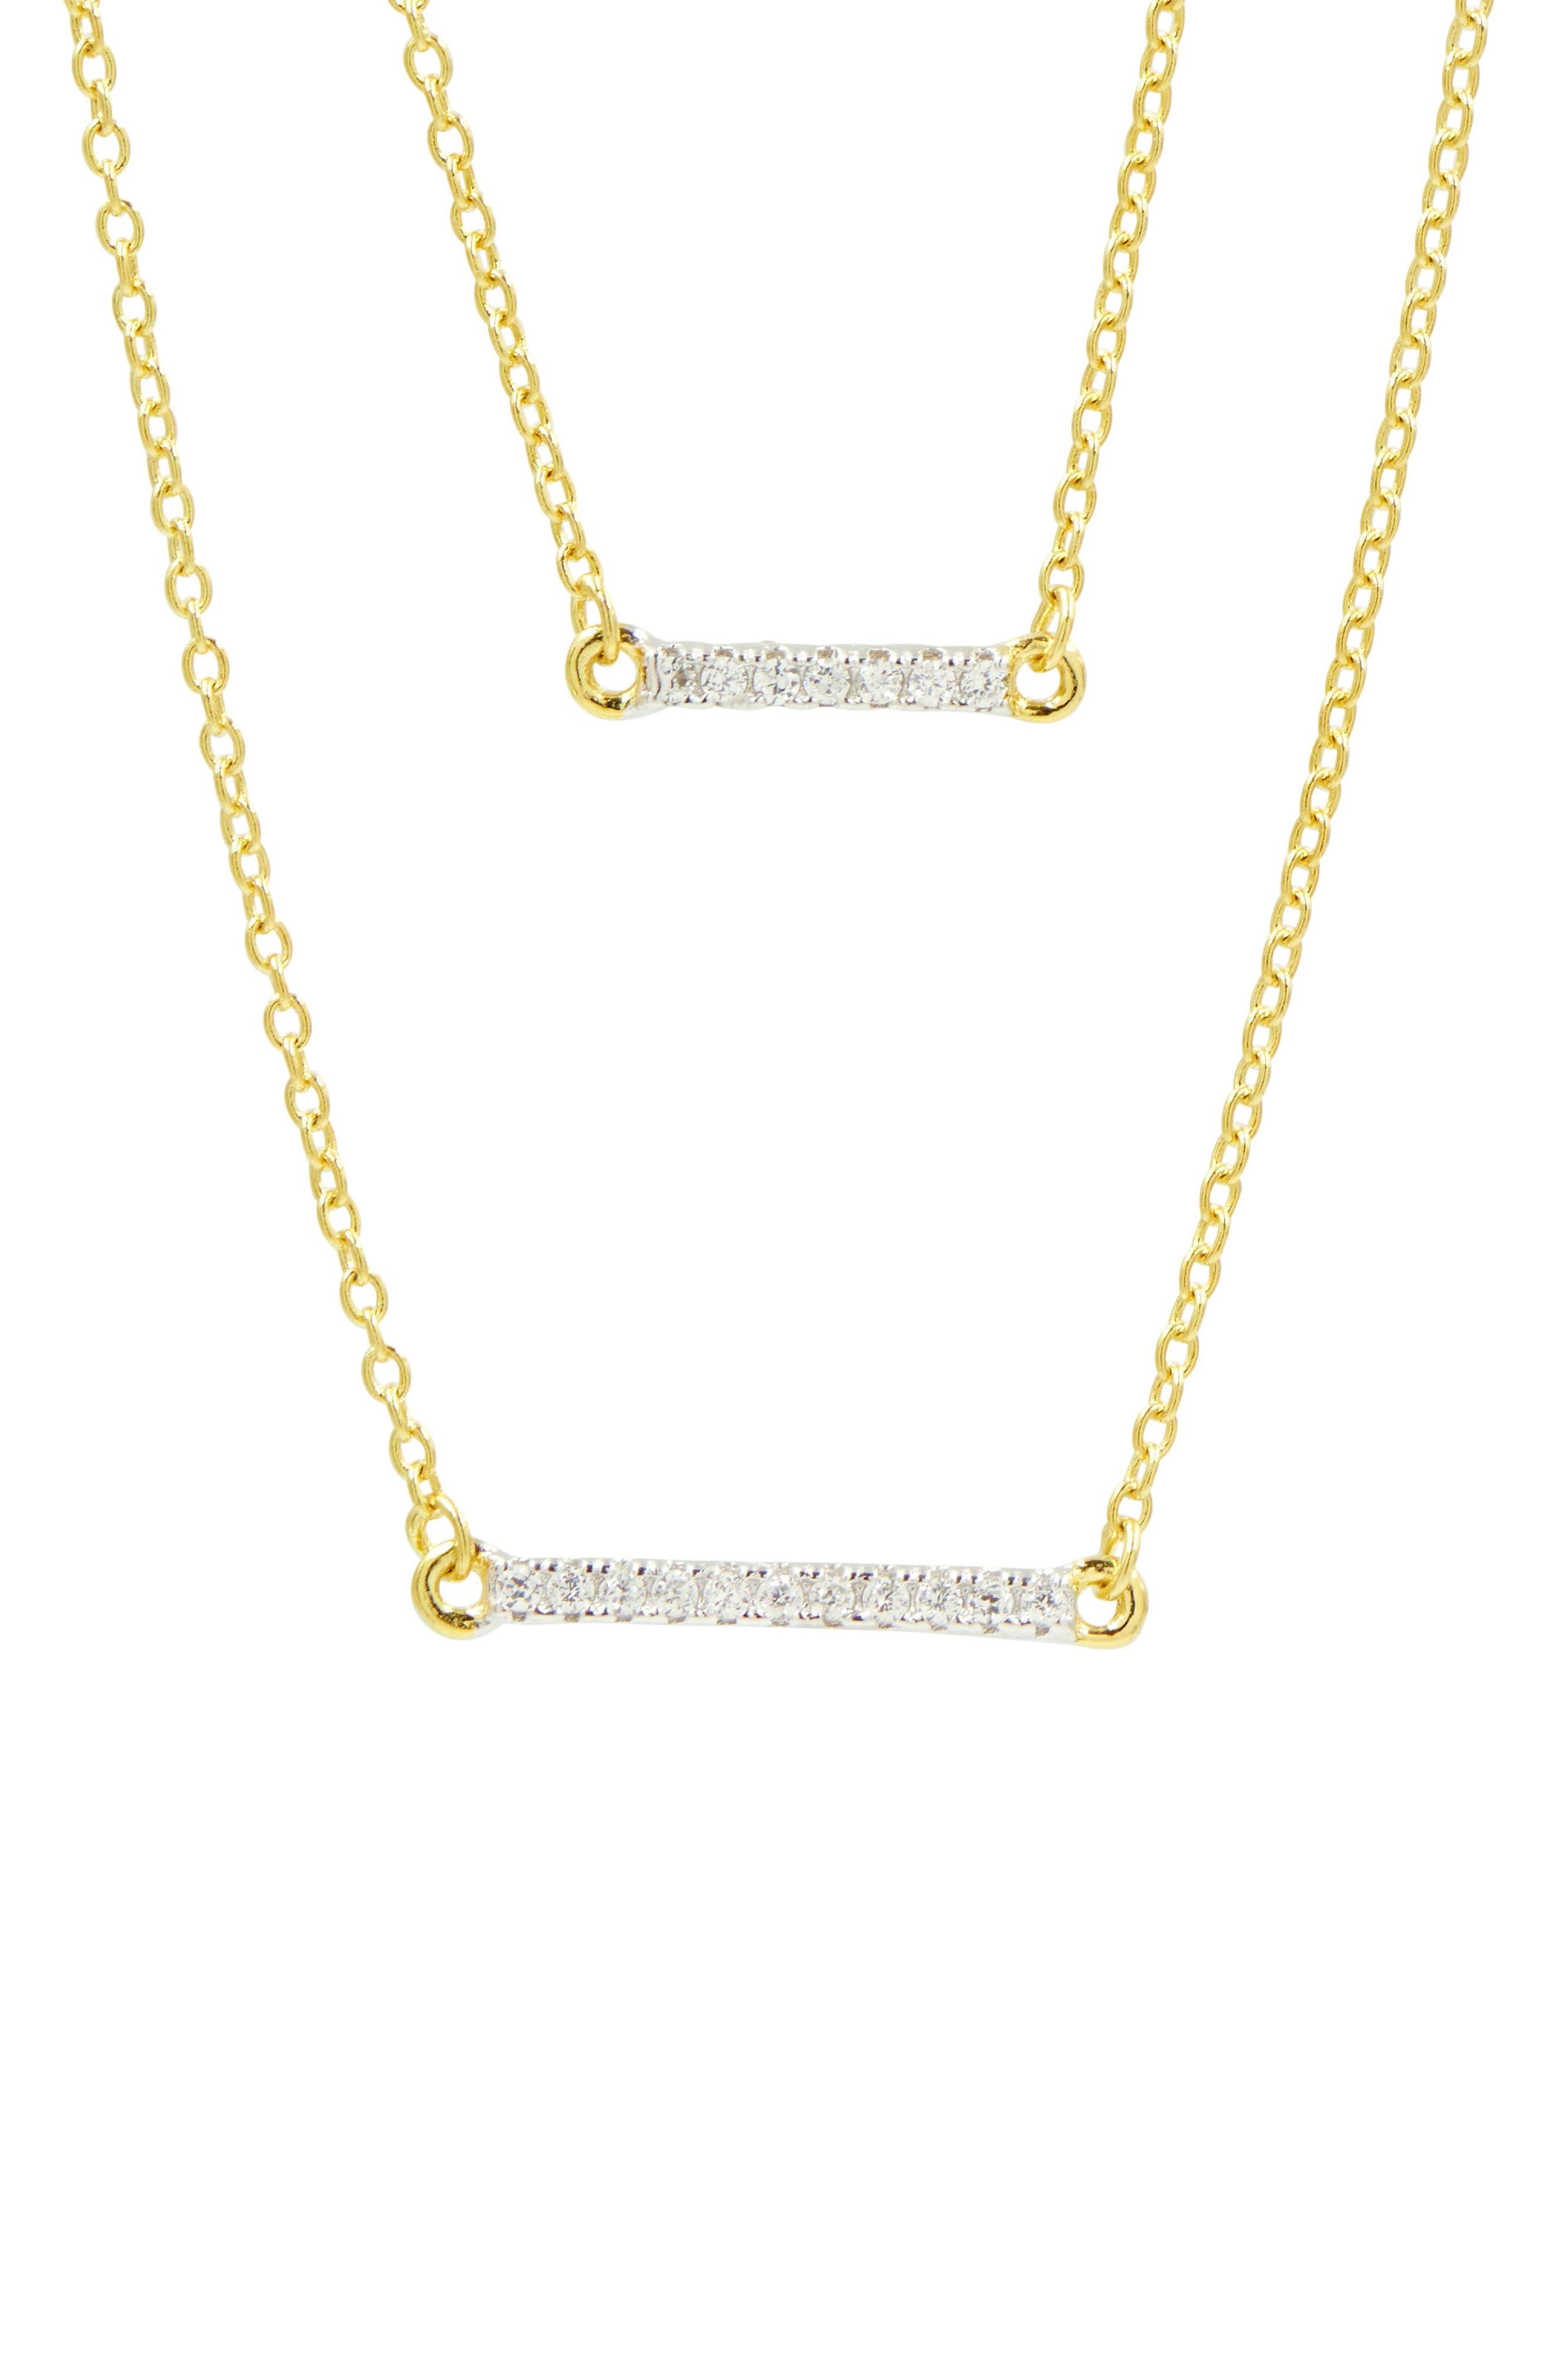 Radiance Double Pendant Necklace,                             Alternate thumbnail 2, color,                             Gold/ Silver